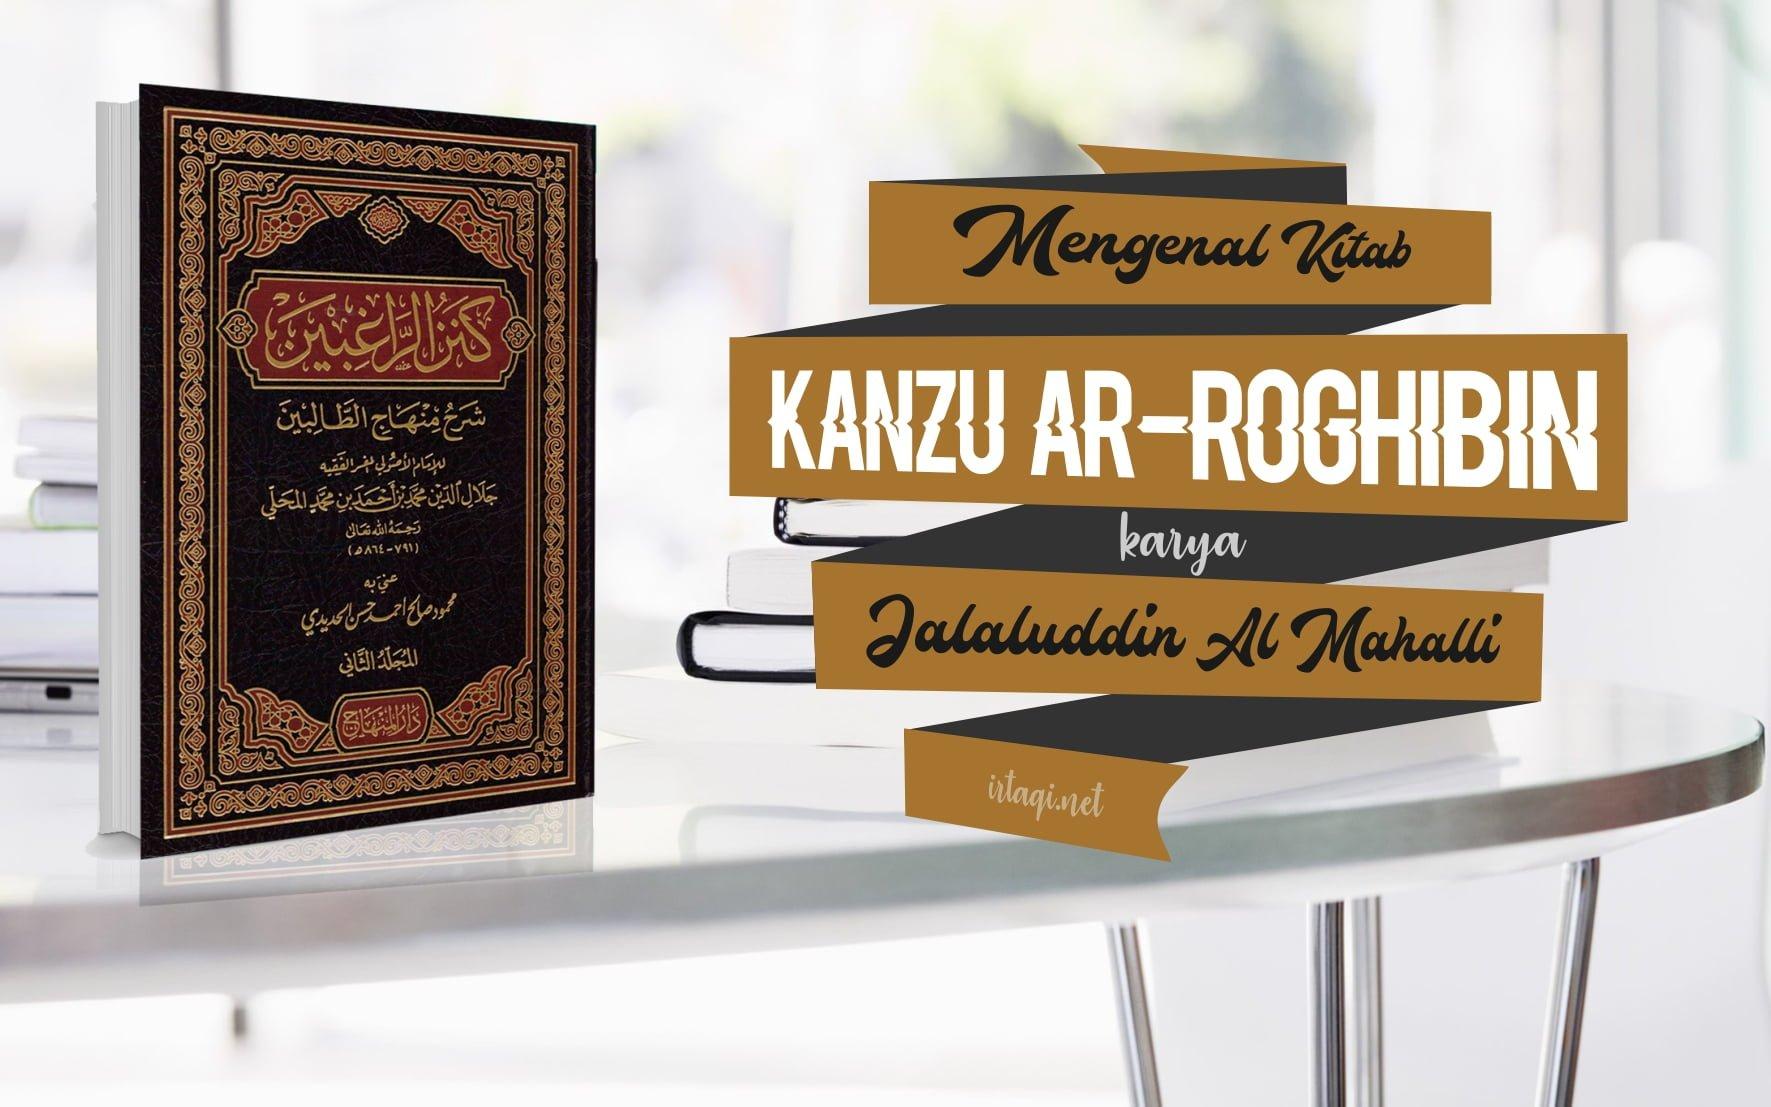 "MENGENAL KITAB ""KANZU AR-ROGHIBIN"" KARYA JALALUDDIN AL-MAHALLI"